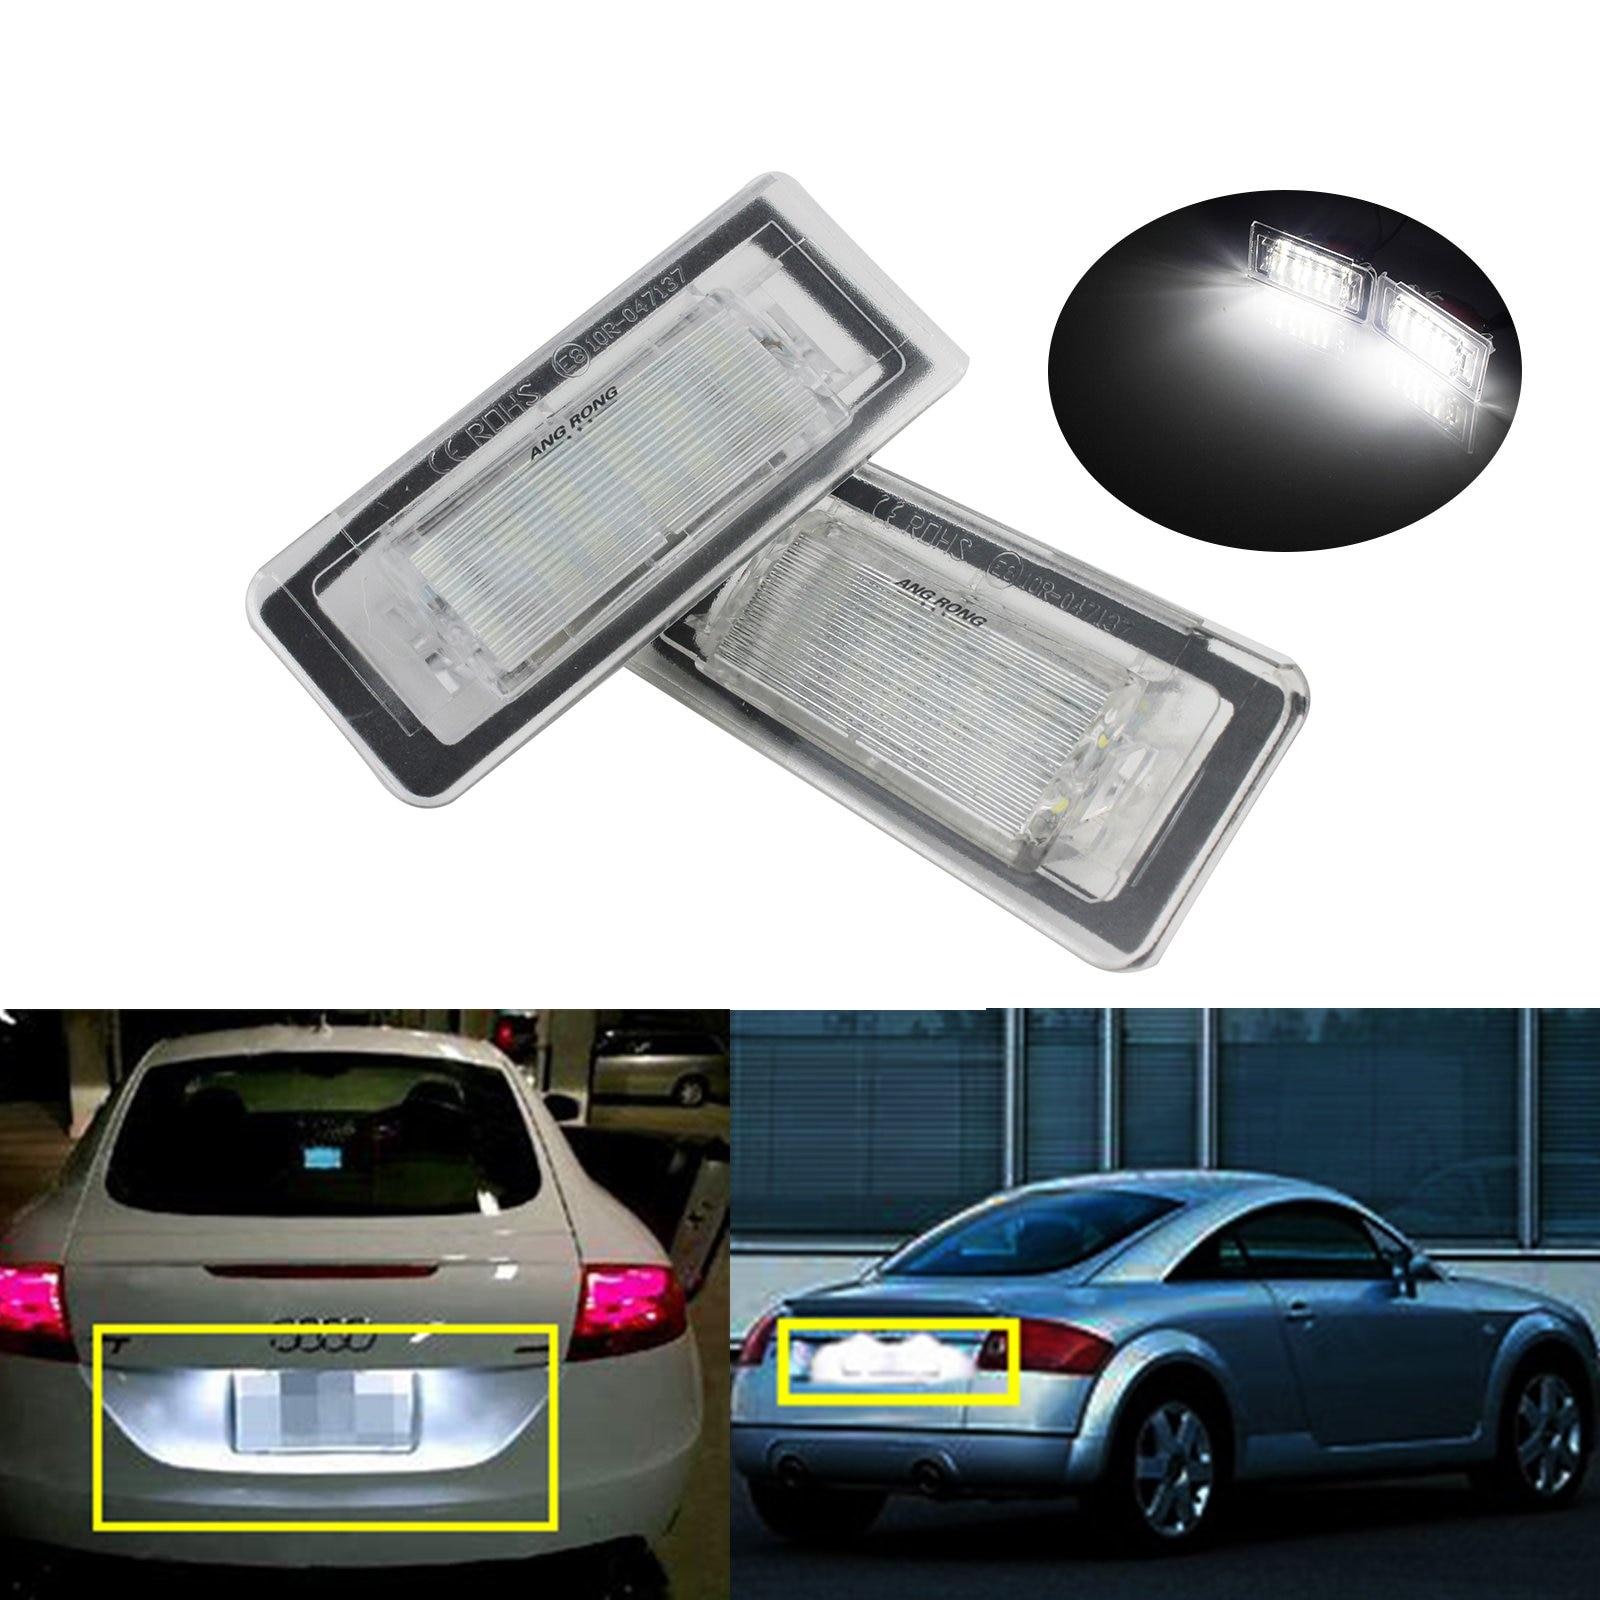 ANGRONG 2x Blanco 18 SMD LED luz de placa de matrícula para Audi TT MK1 8N 1999-06